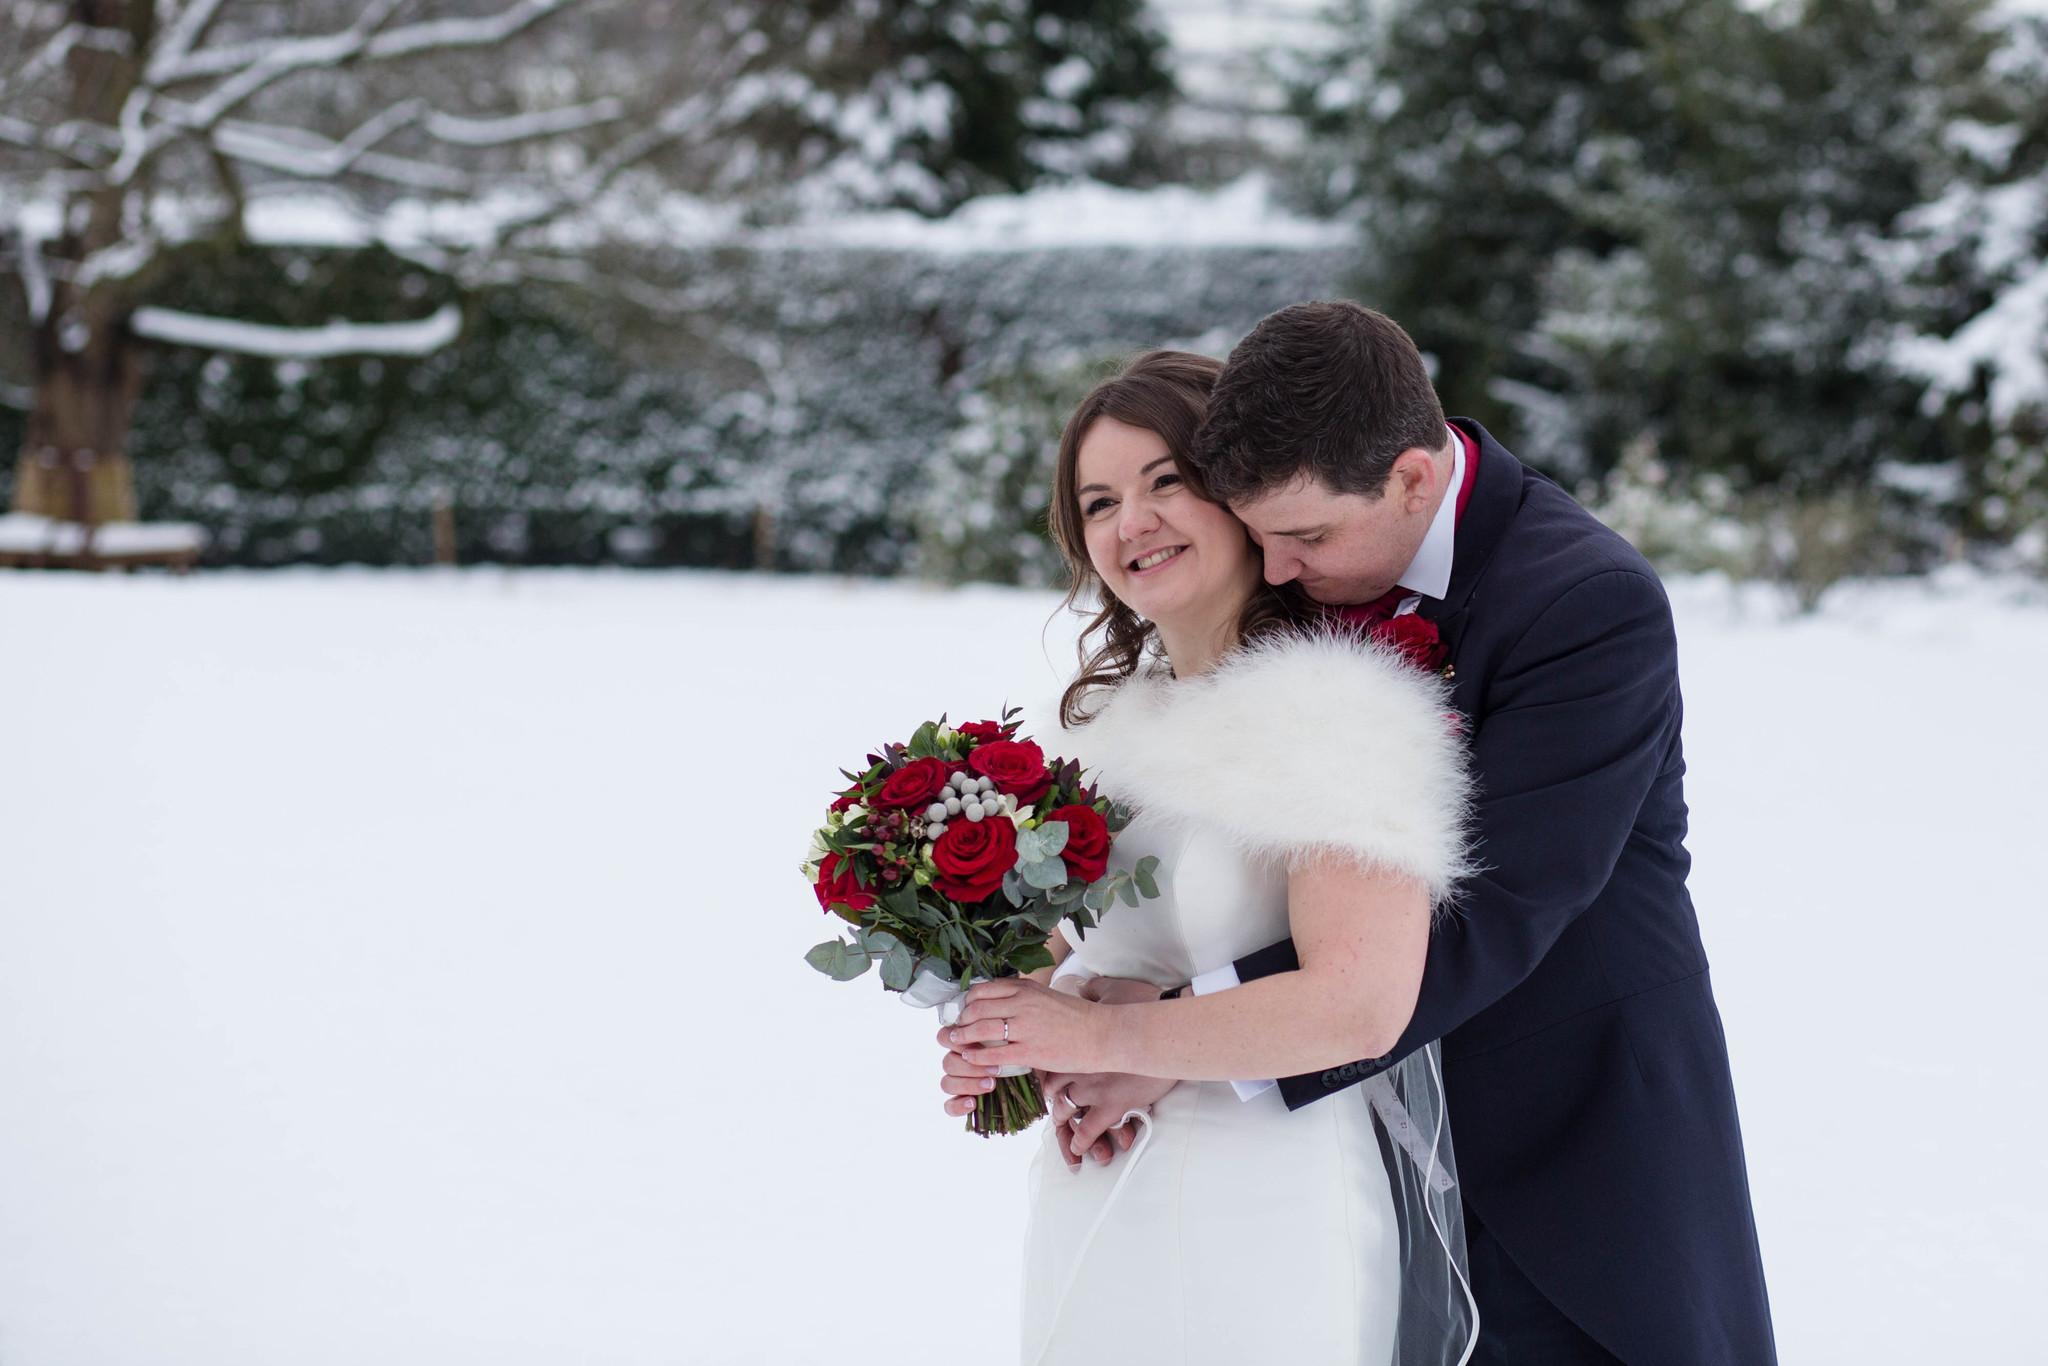 Winter Wedding Goldstone Hall Shropshire December 2017